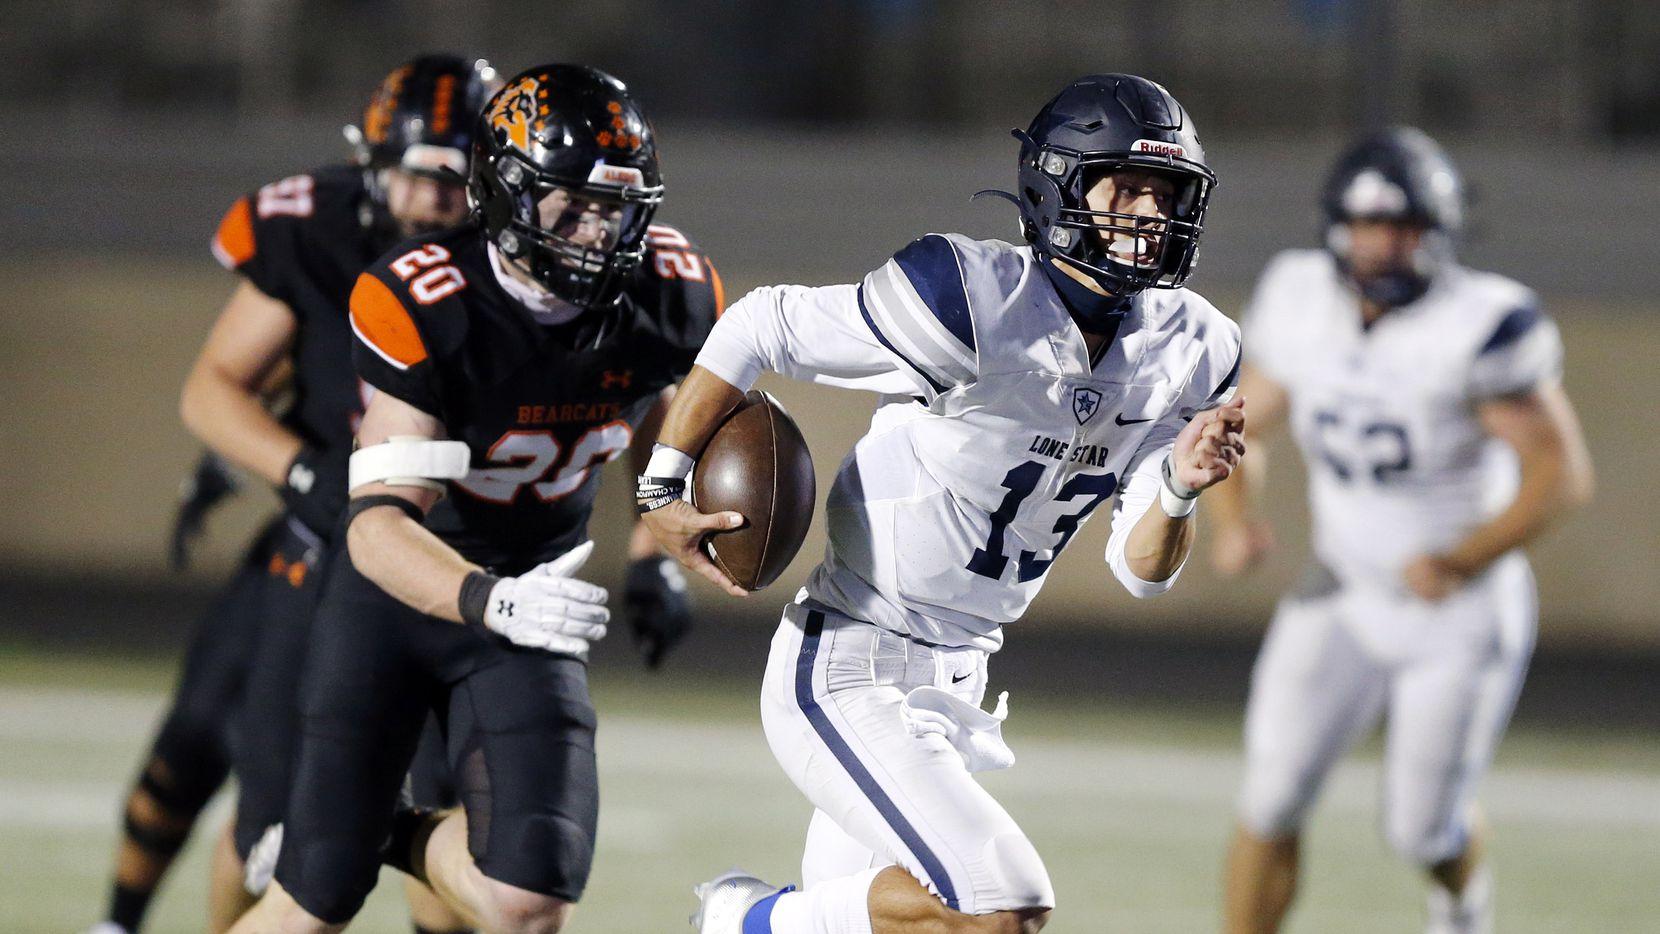 Frisco Lone Star quarterback Garret Rangel breaks away for a big run in the fourth quarter against Aledo's Sam Forman at Bearcat Stadium in Aledo, Texas, Friday, October 2 2020. Aledo won, 34-32.